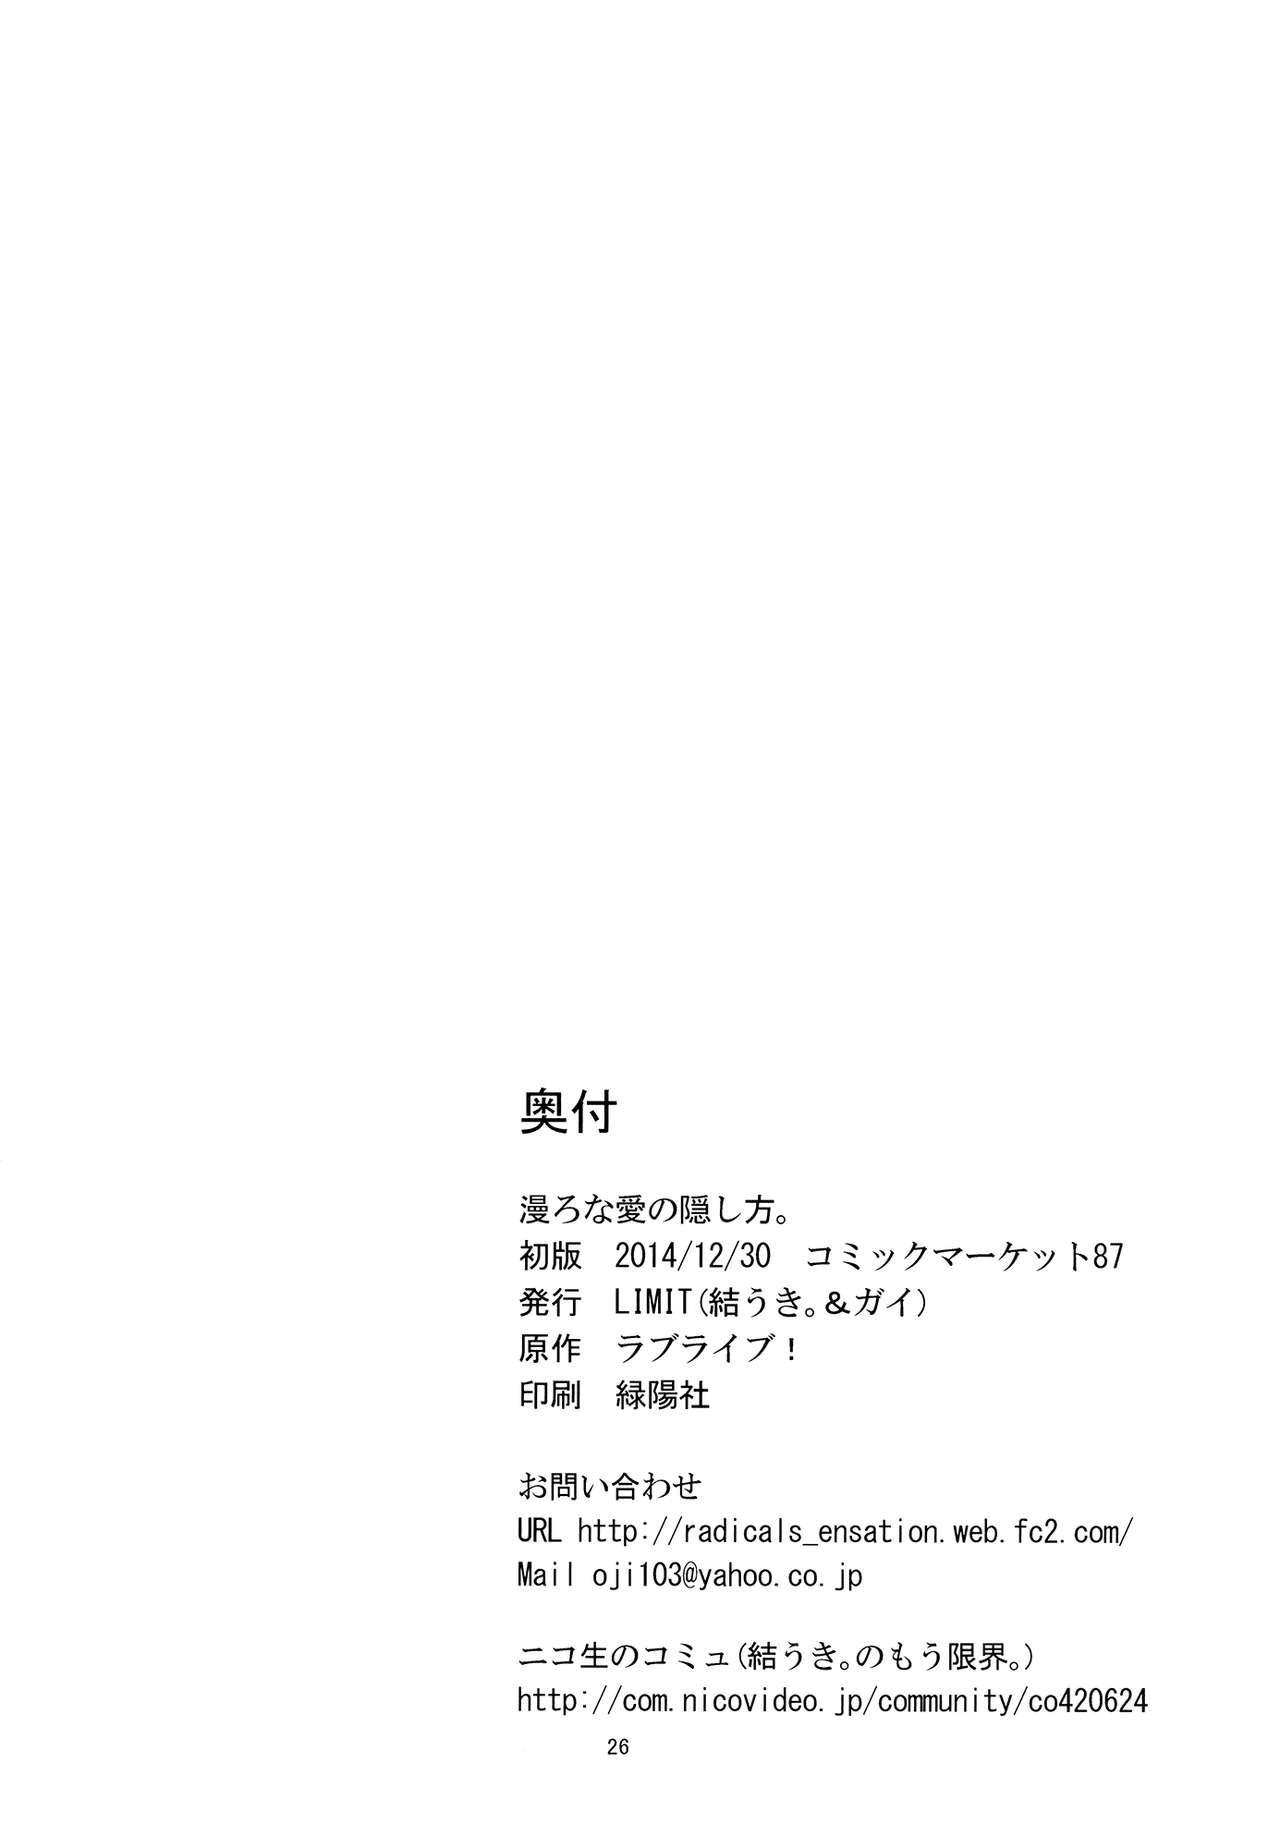 Sozoro na Ai no Kakushikata. | How can I hide this drowning love? 24